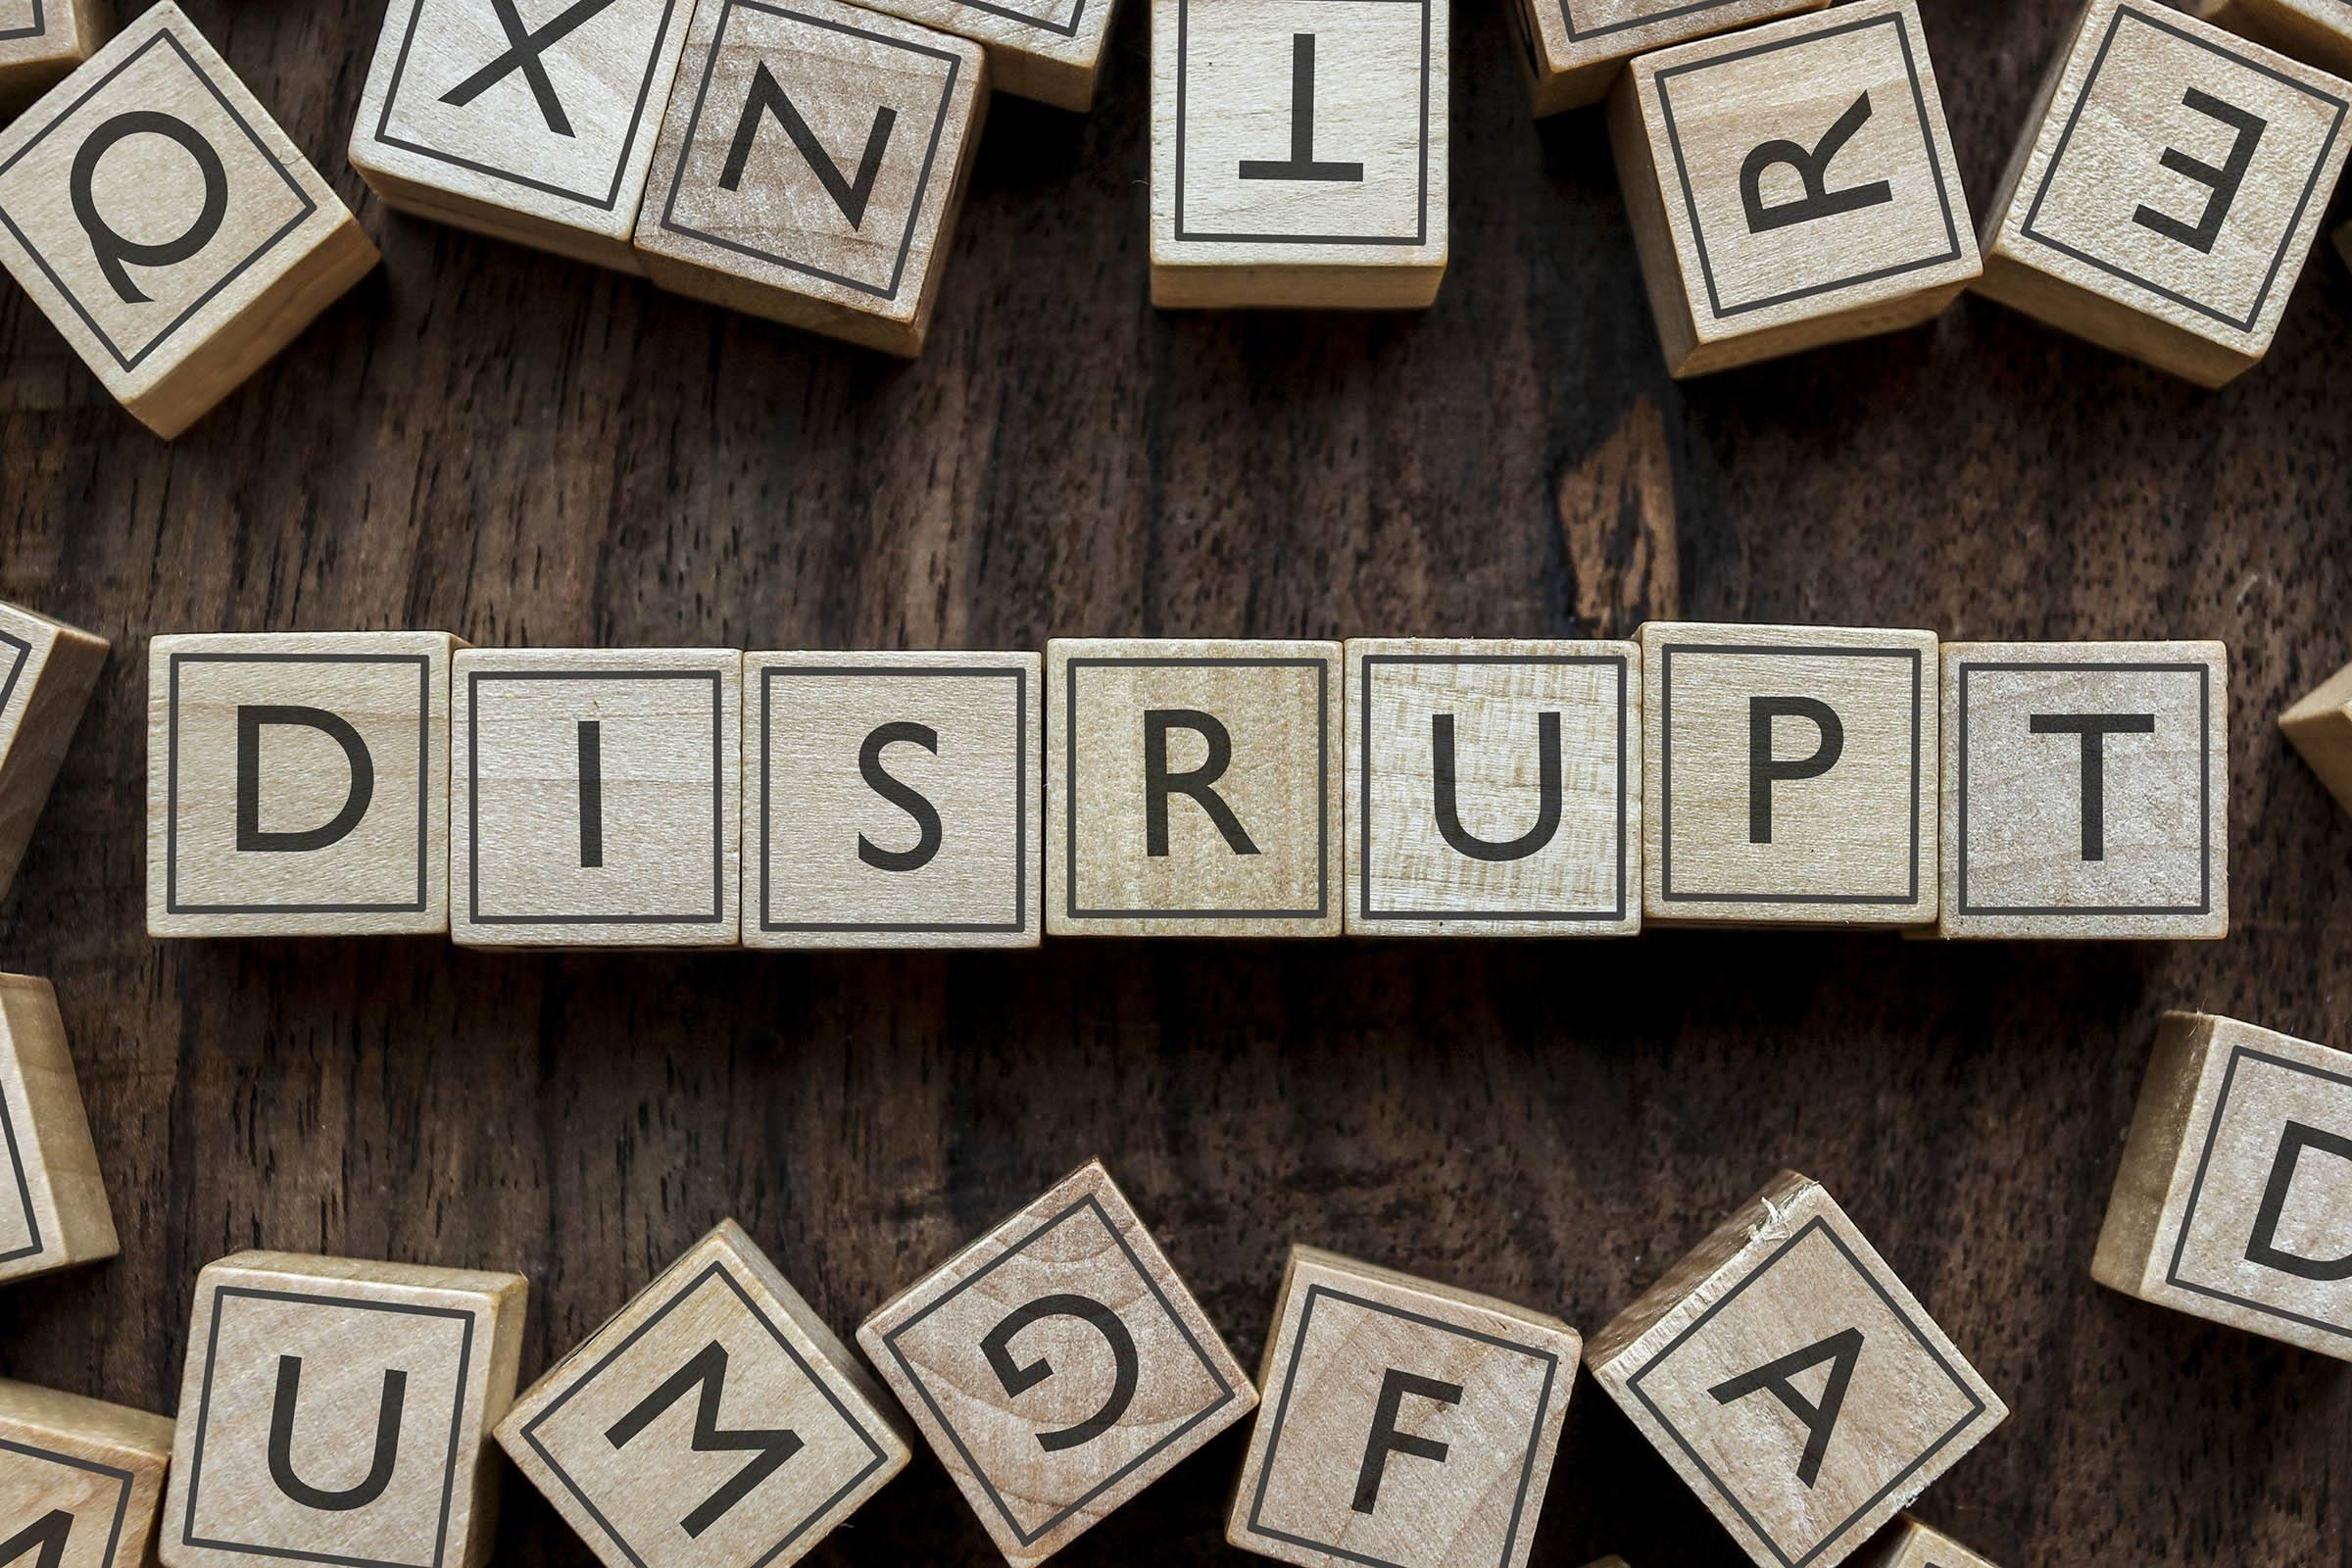 Disrupt industry